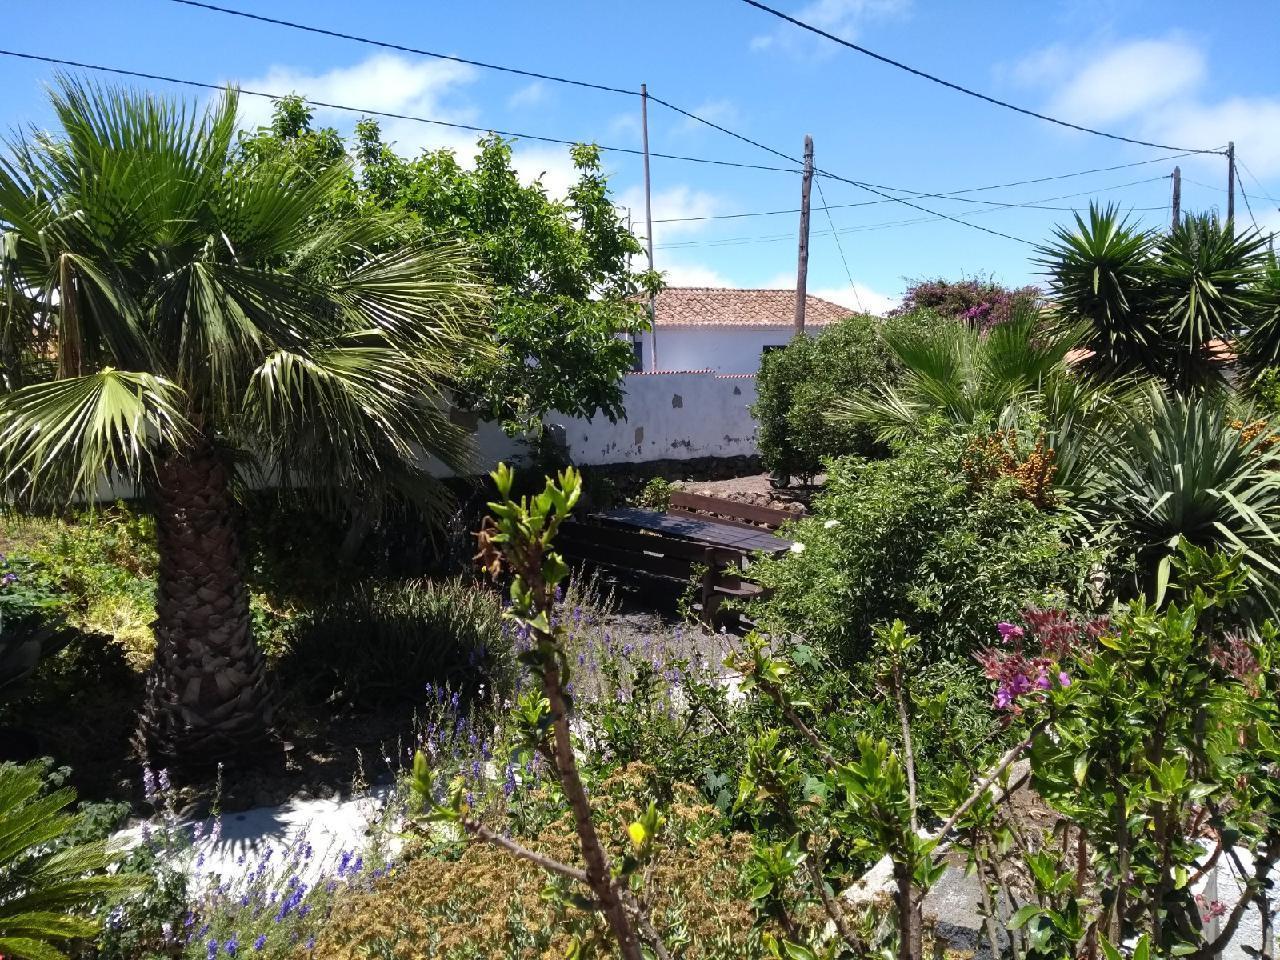 Ferienhaus Finca Primavera (144700), El Paso, La Palma, Kanarische Inseln, Spanien, Bild 22